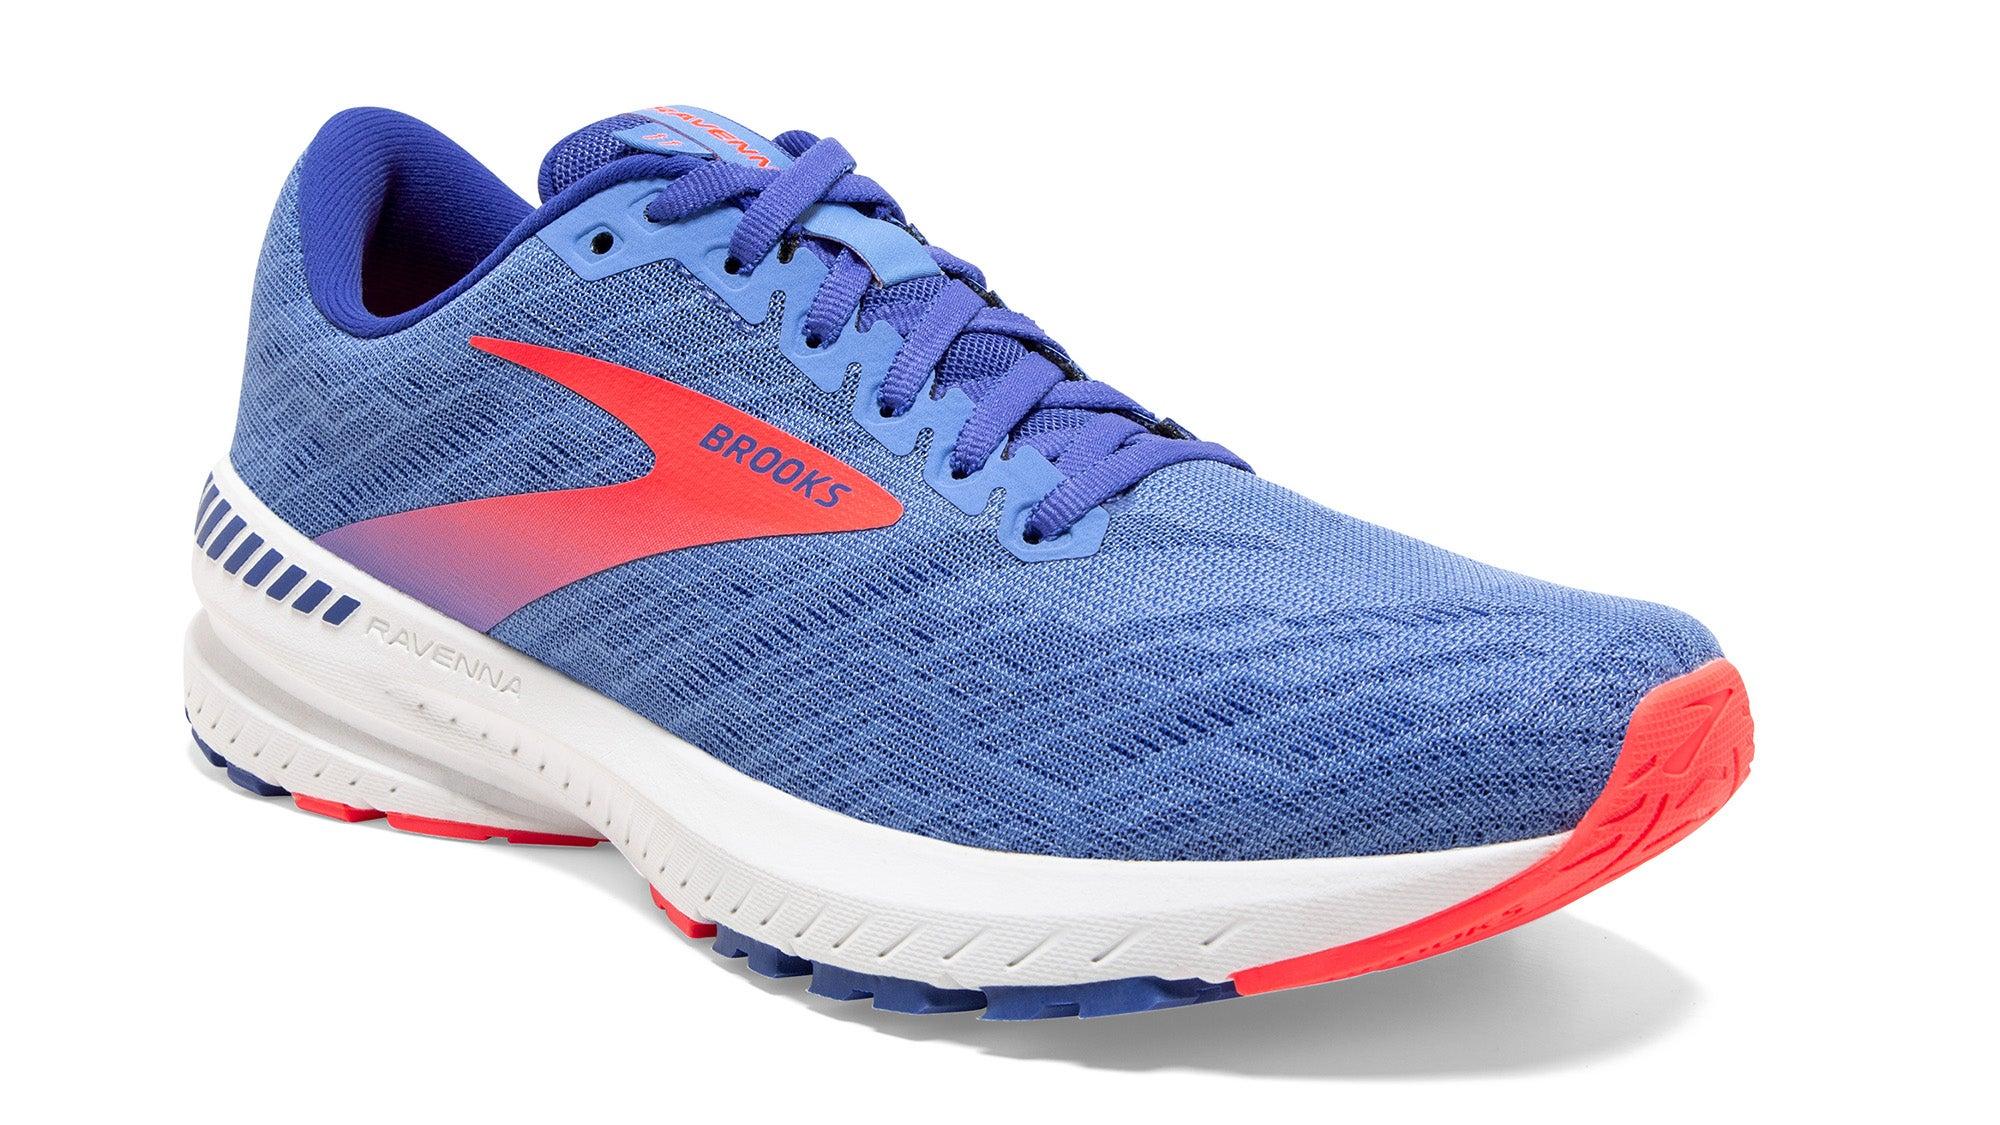 Brooks Ravenna half marathon shoe